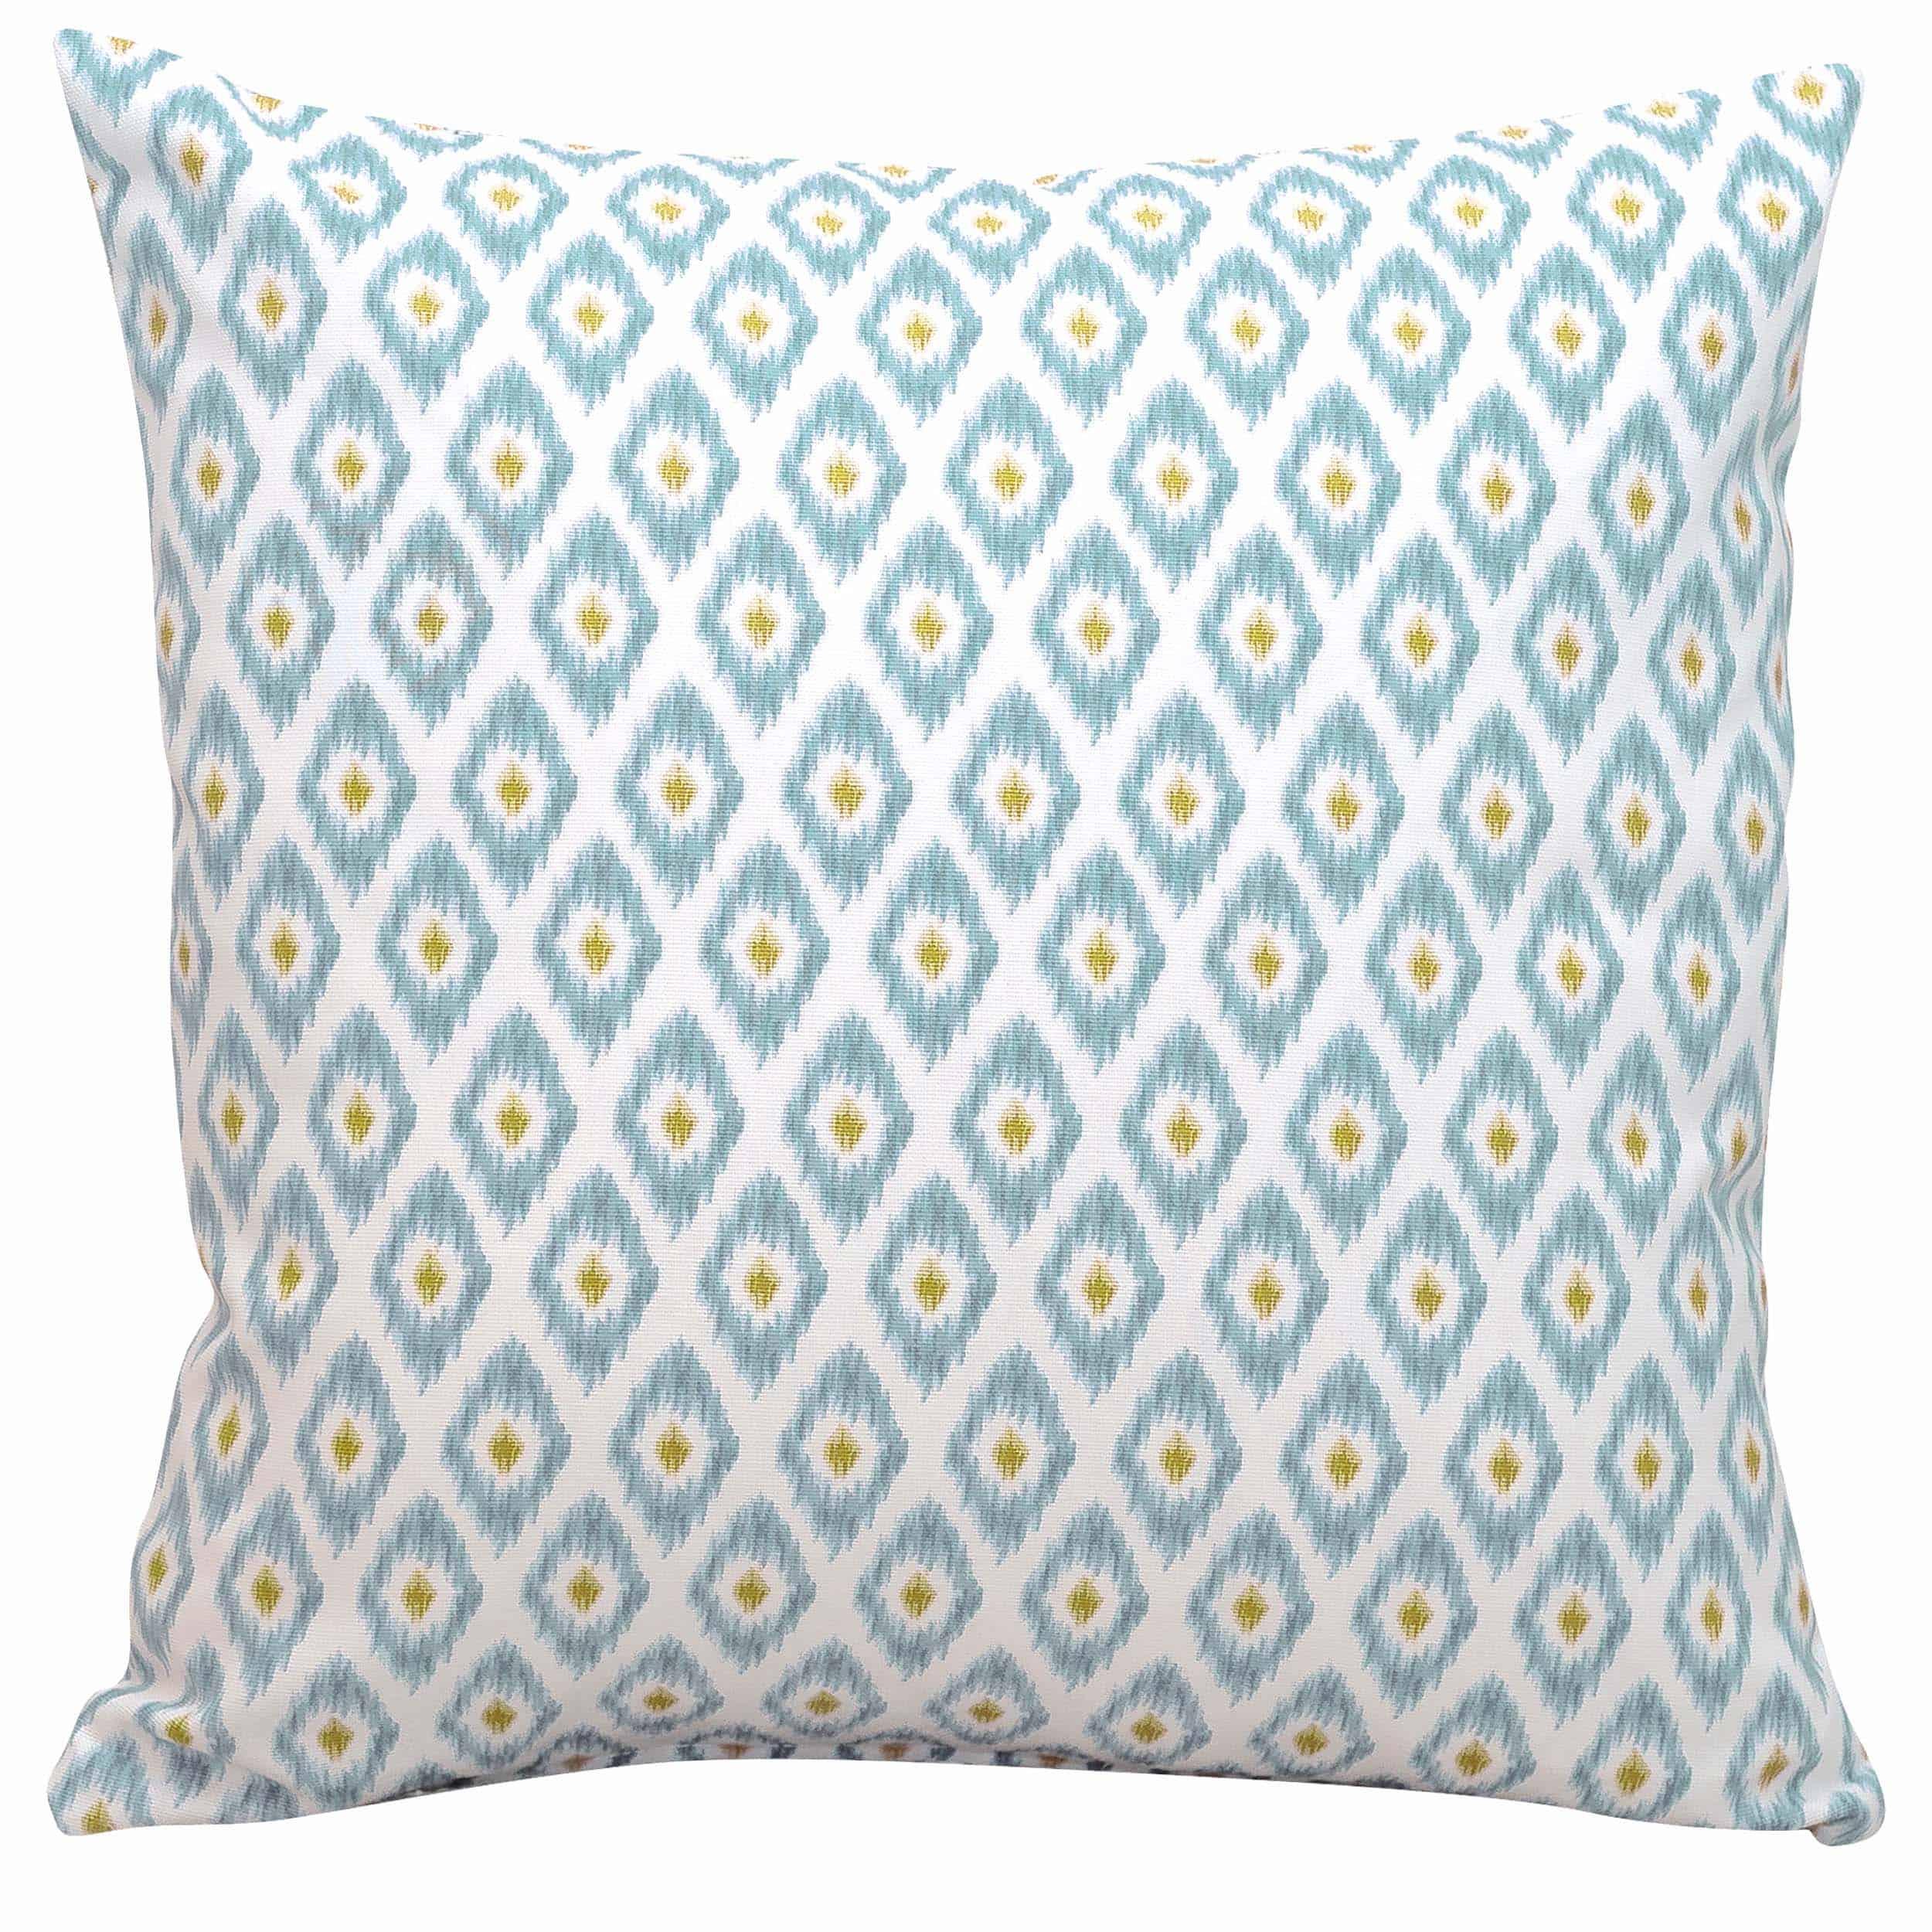 Watercolour Ikat Cushion in Duck Egg Blue